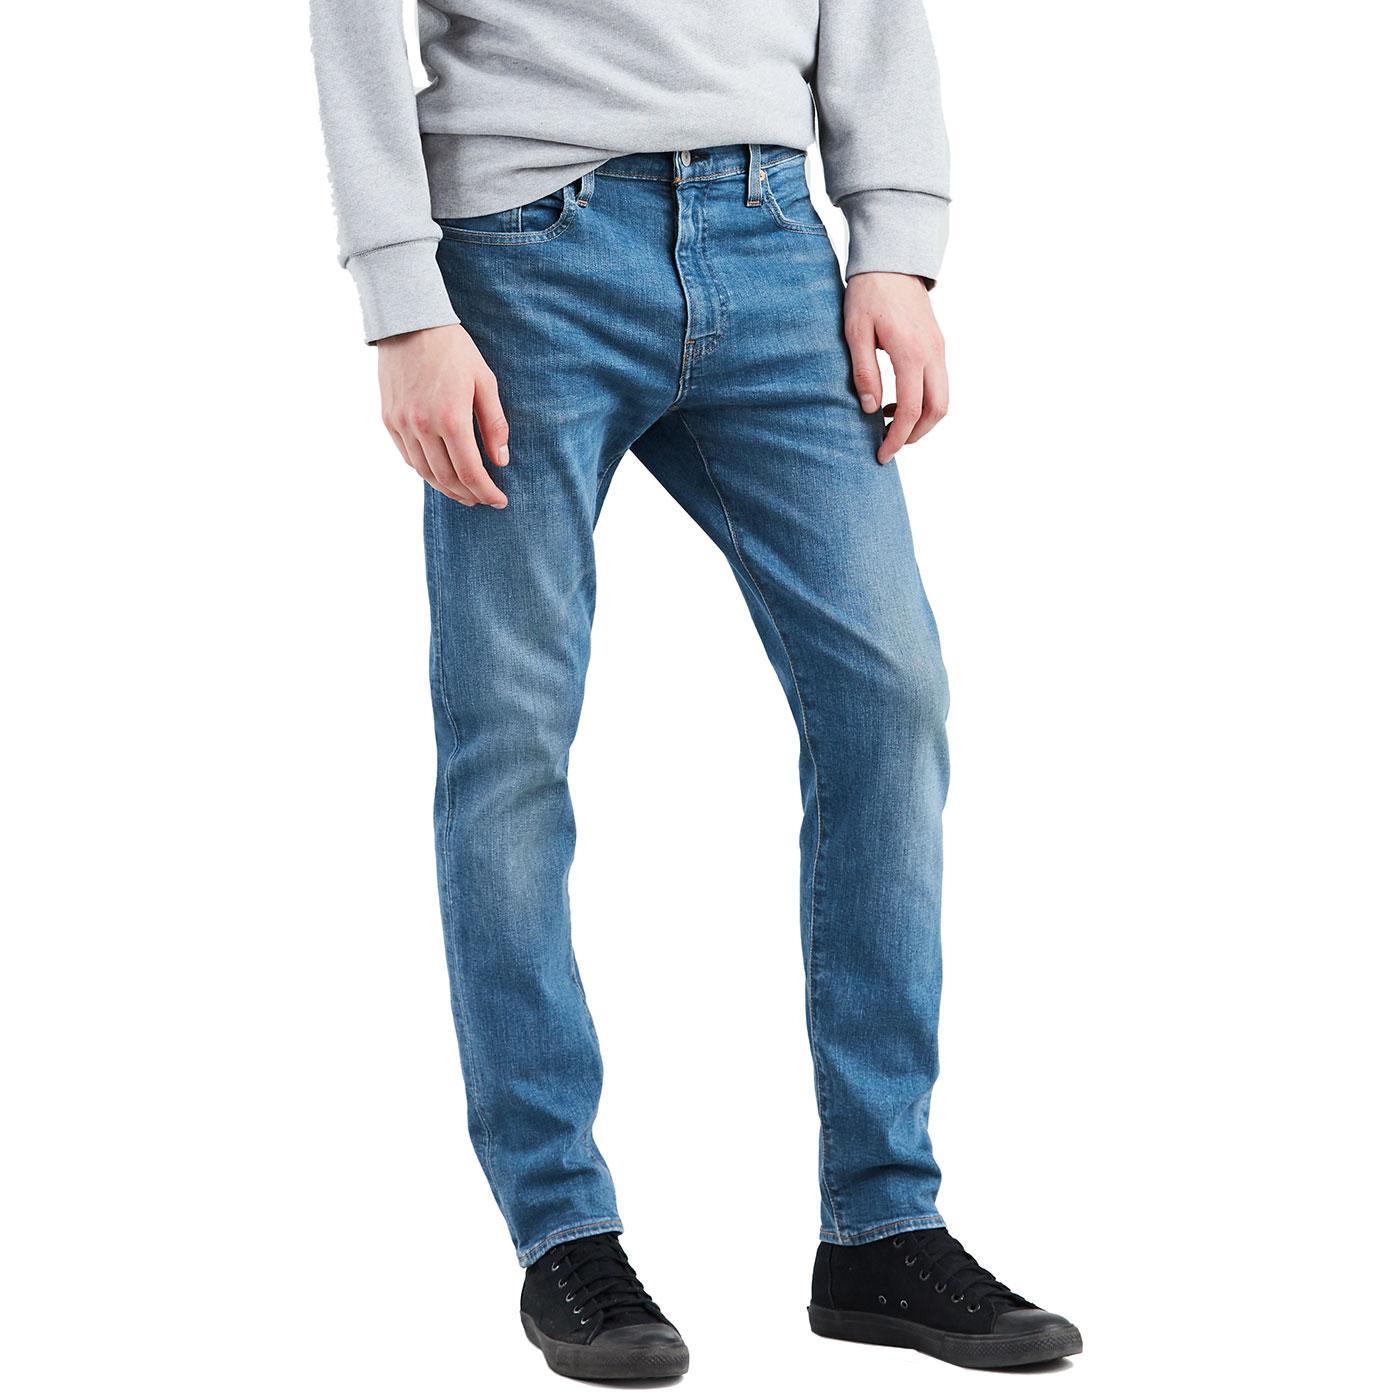 LEVI'S 512 Slim Taper Denim Jeans (4 Leaf Clover)